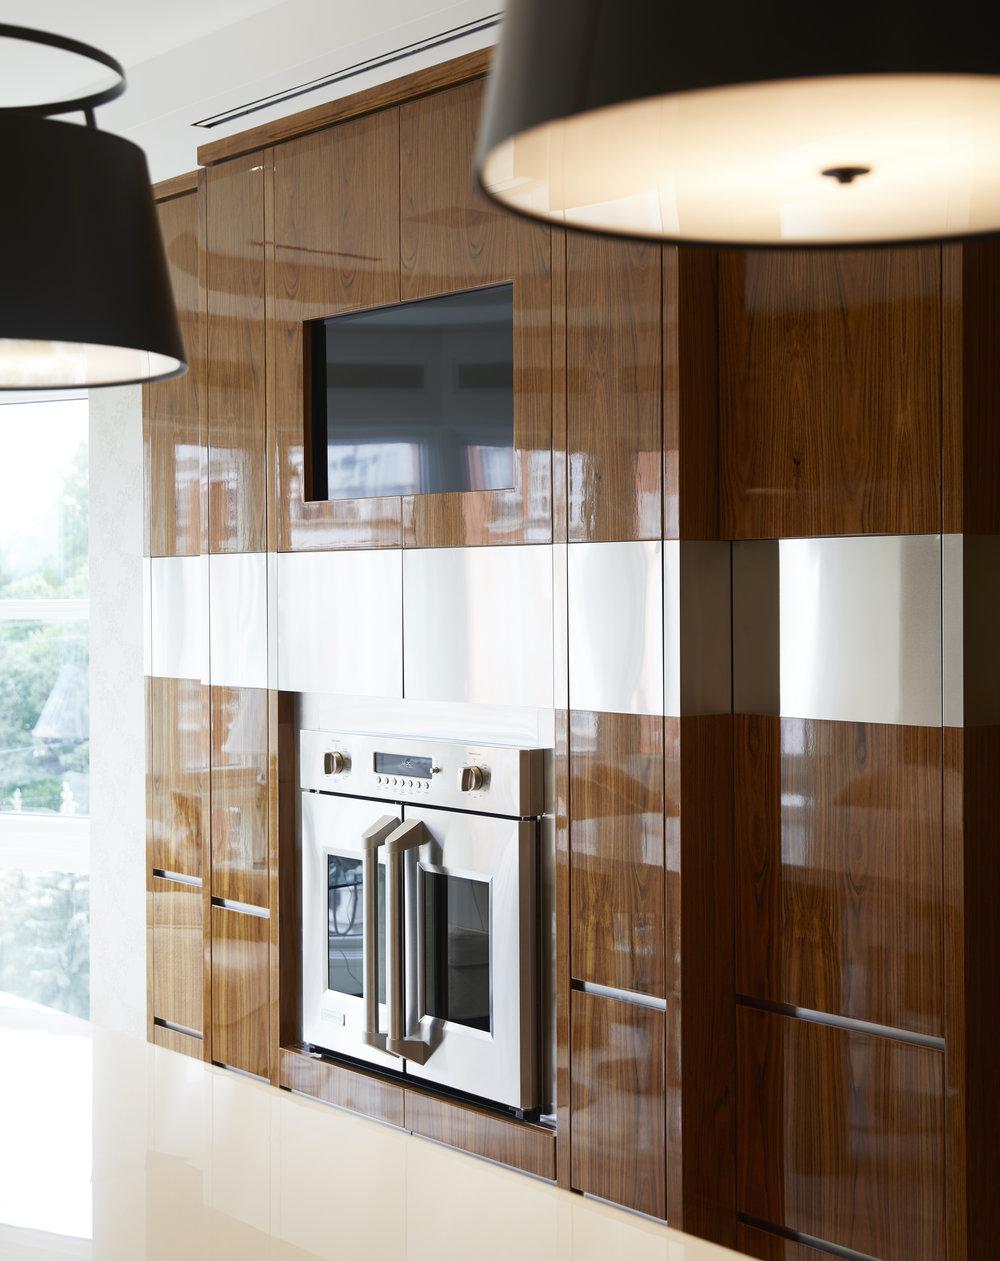 6_Kitchen_Oven.jpg